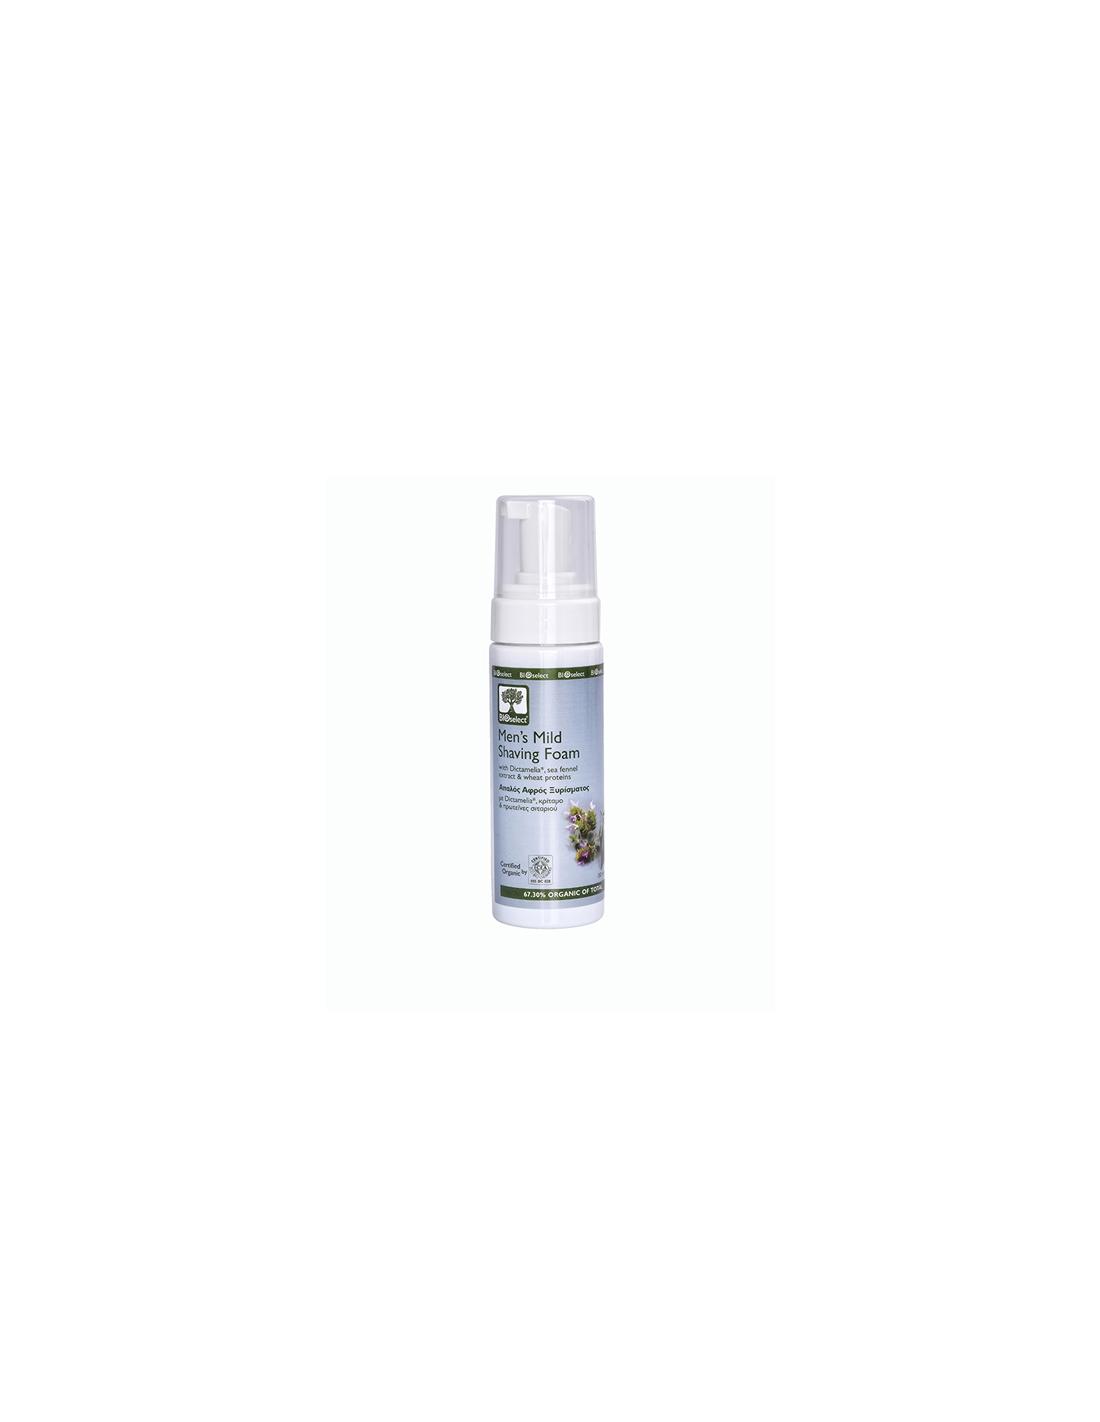 bioselect-men-s-mild-shaving-foam-150ml1.jpg